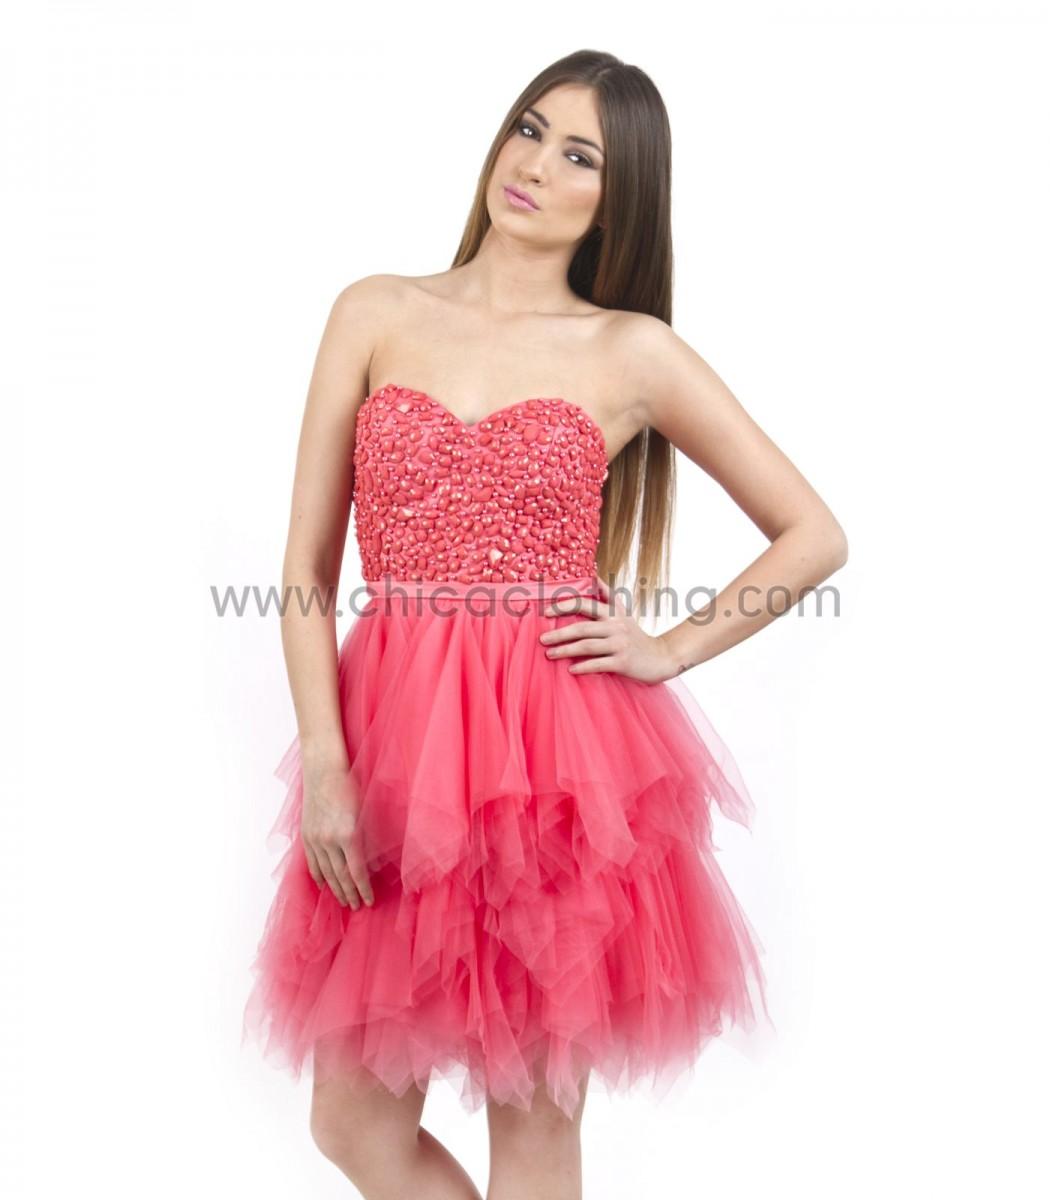 a02e03a0f14 Αμπιγιέ φουξ φόρεμα για γάμο στράπλες με τούλι tutu φούστα